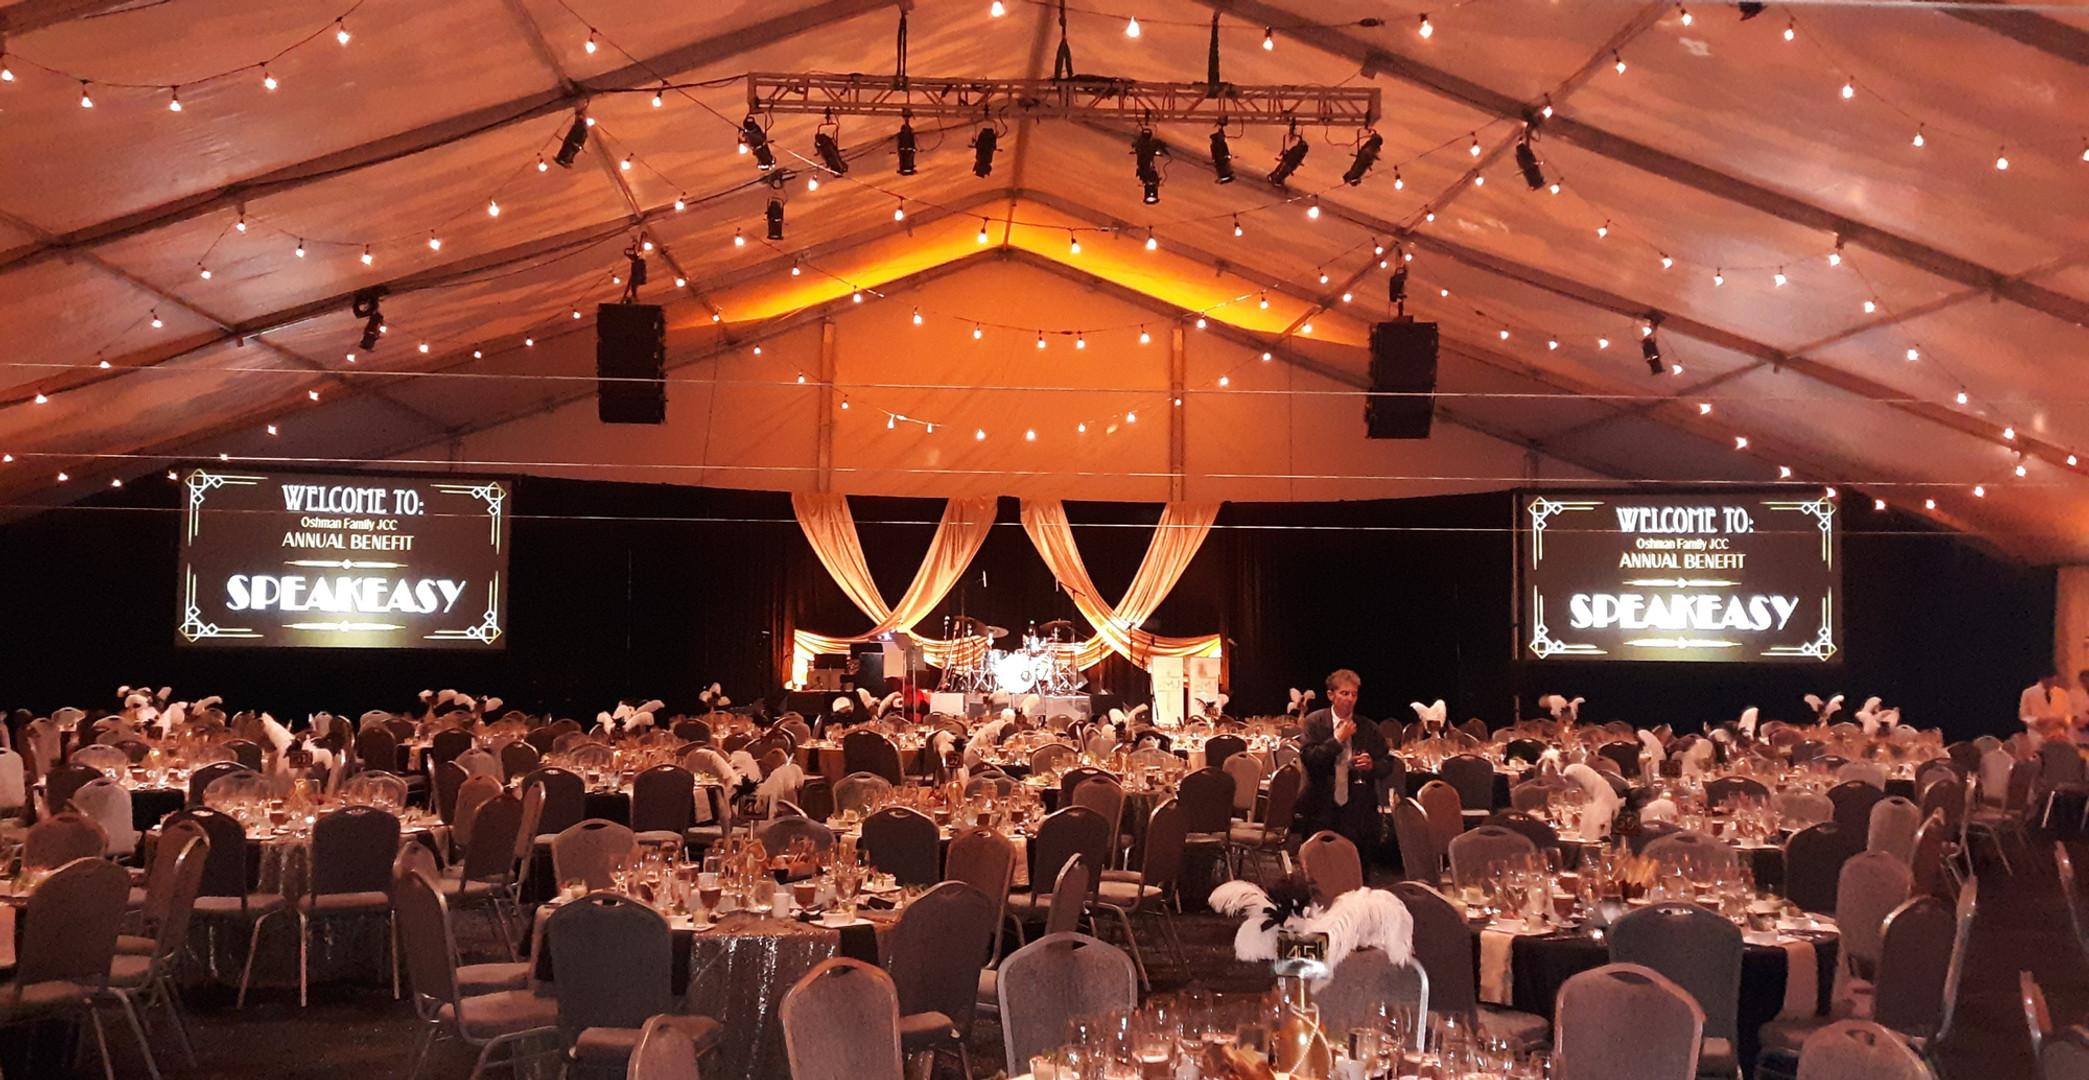 Annual Gala for Jewish Community Center